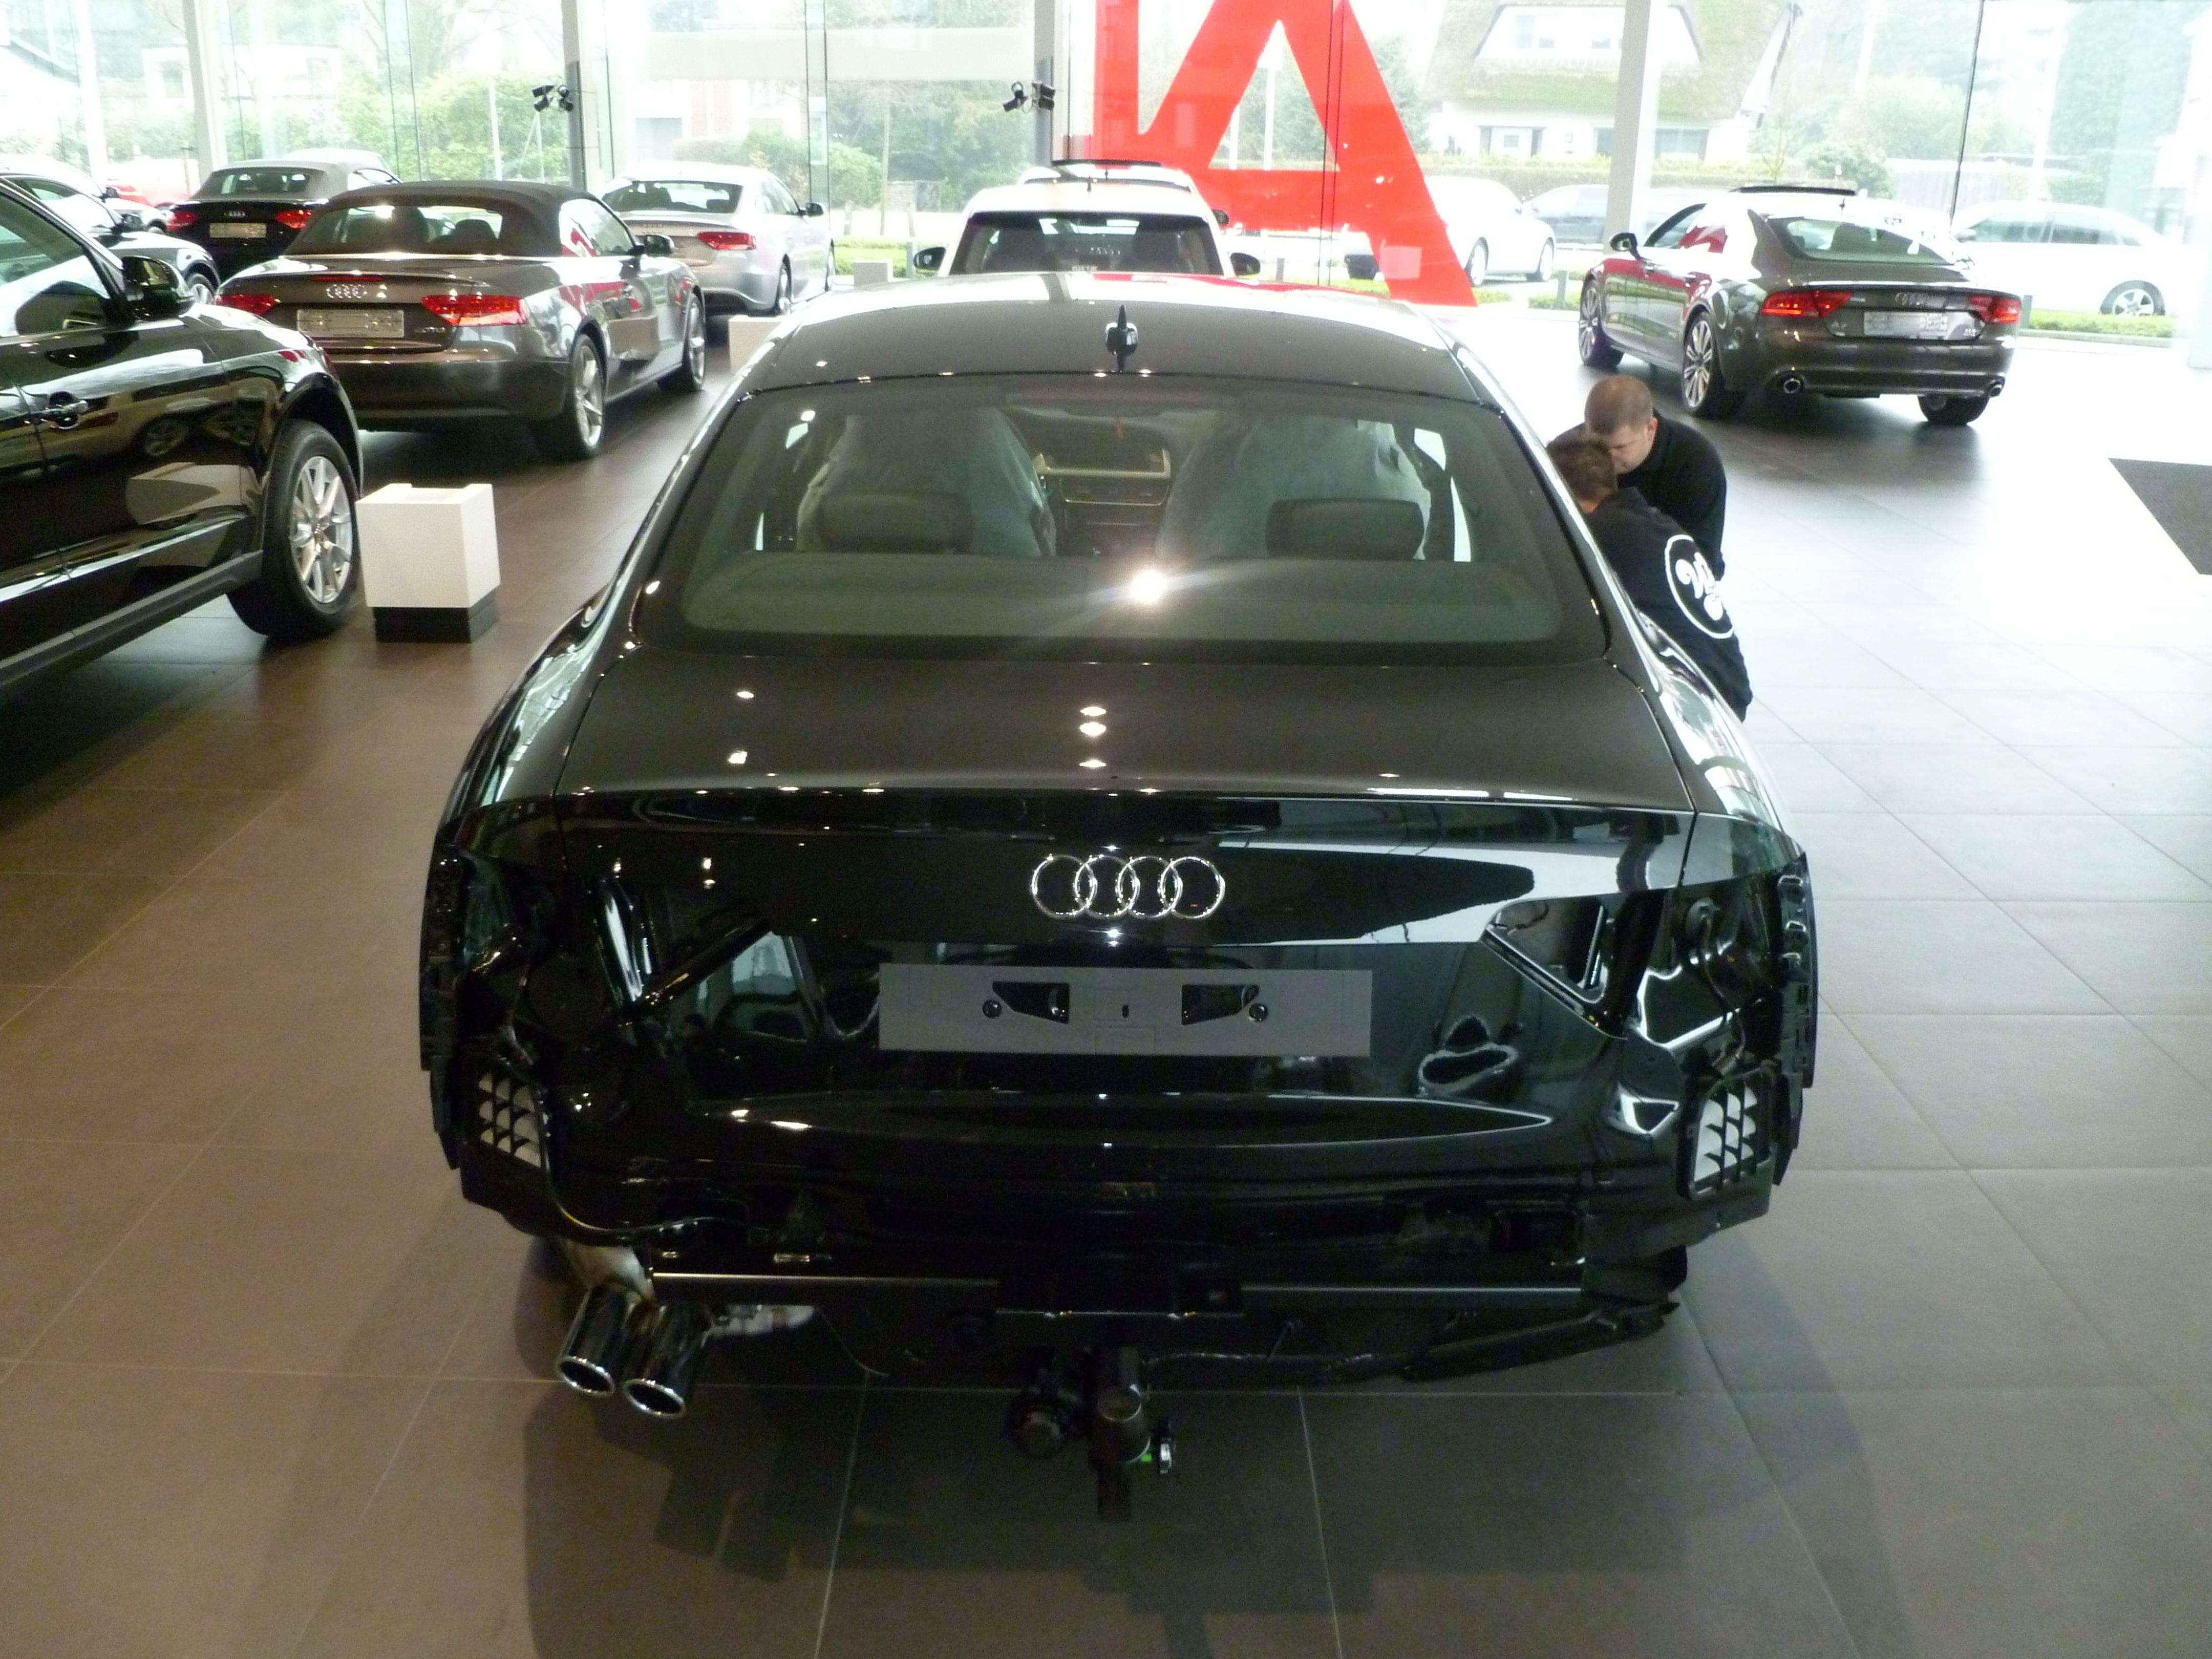 Audi A5 Coupe met Mat Zwarte Wrap, Carwrapping door Wrapmyride.nu Foto-nr:4613, ©2021